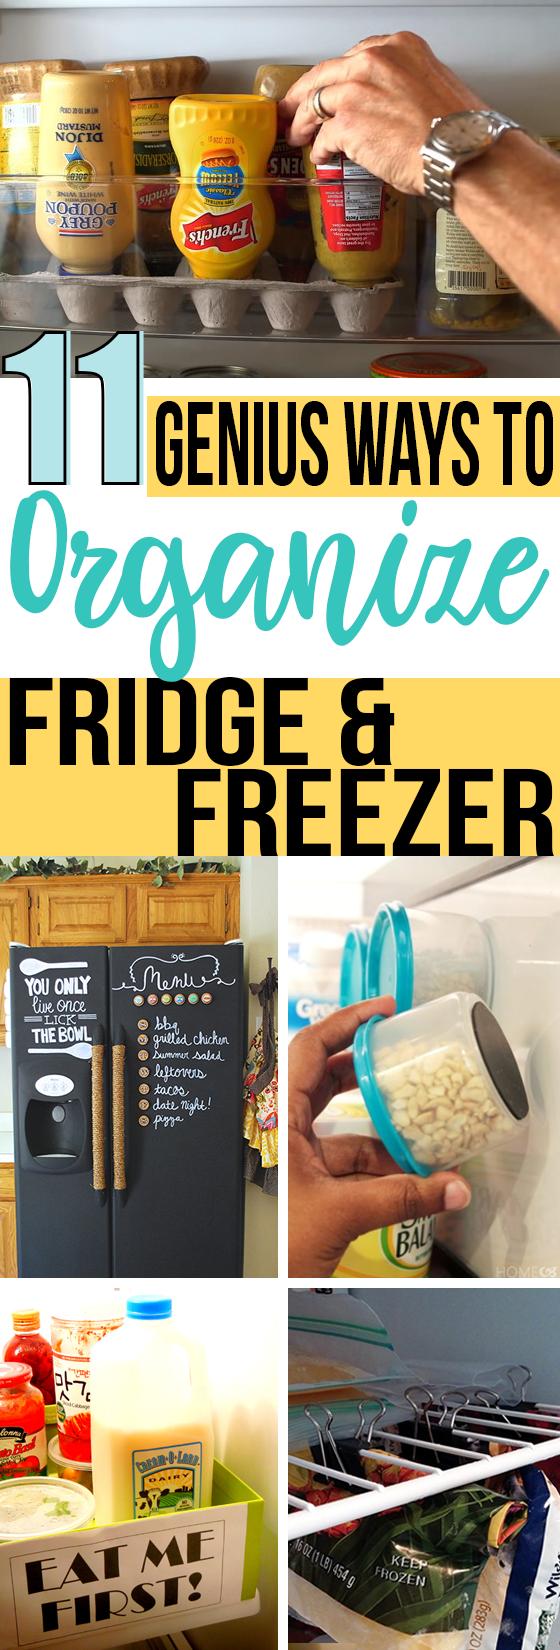 fridge-freezer-organization-hacks-pinterest2.png